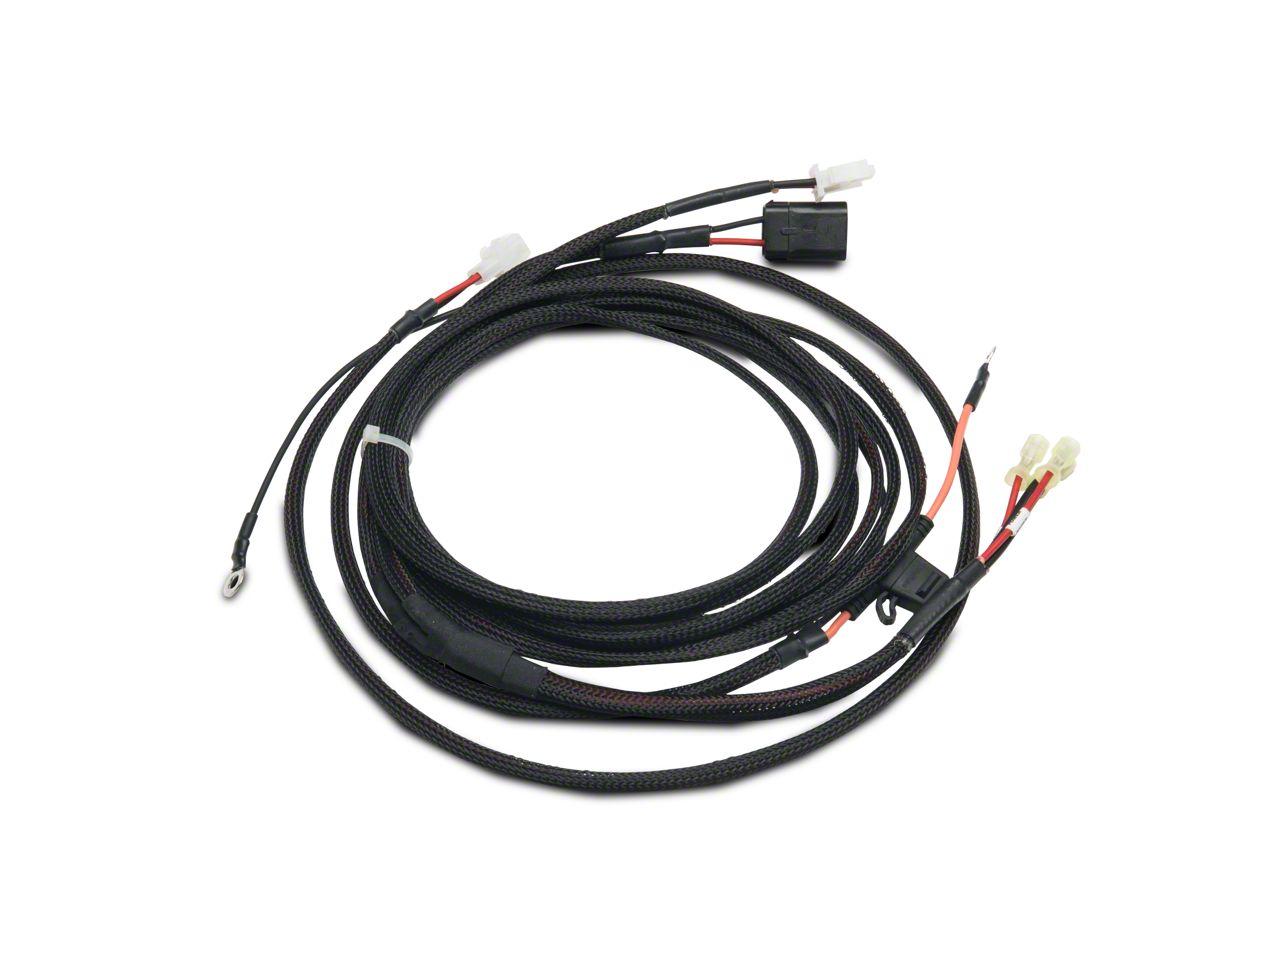 Bestop Defroster/Wiper Wiring Harness for Trektop Pro (07-18 Jeep Wrangler JK)